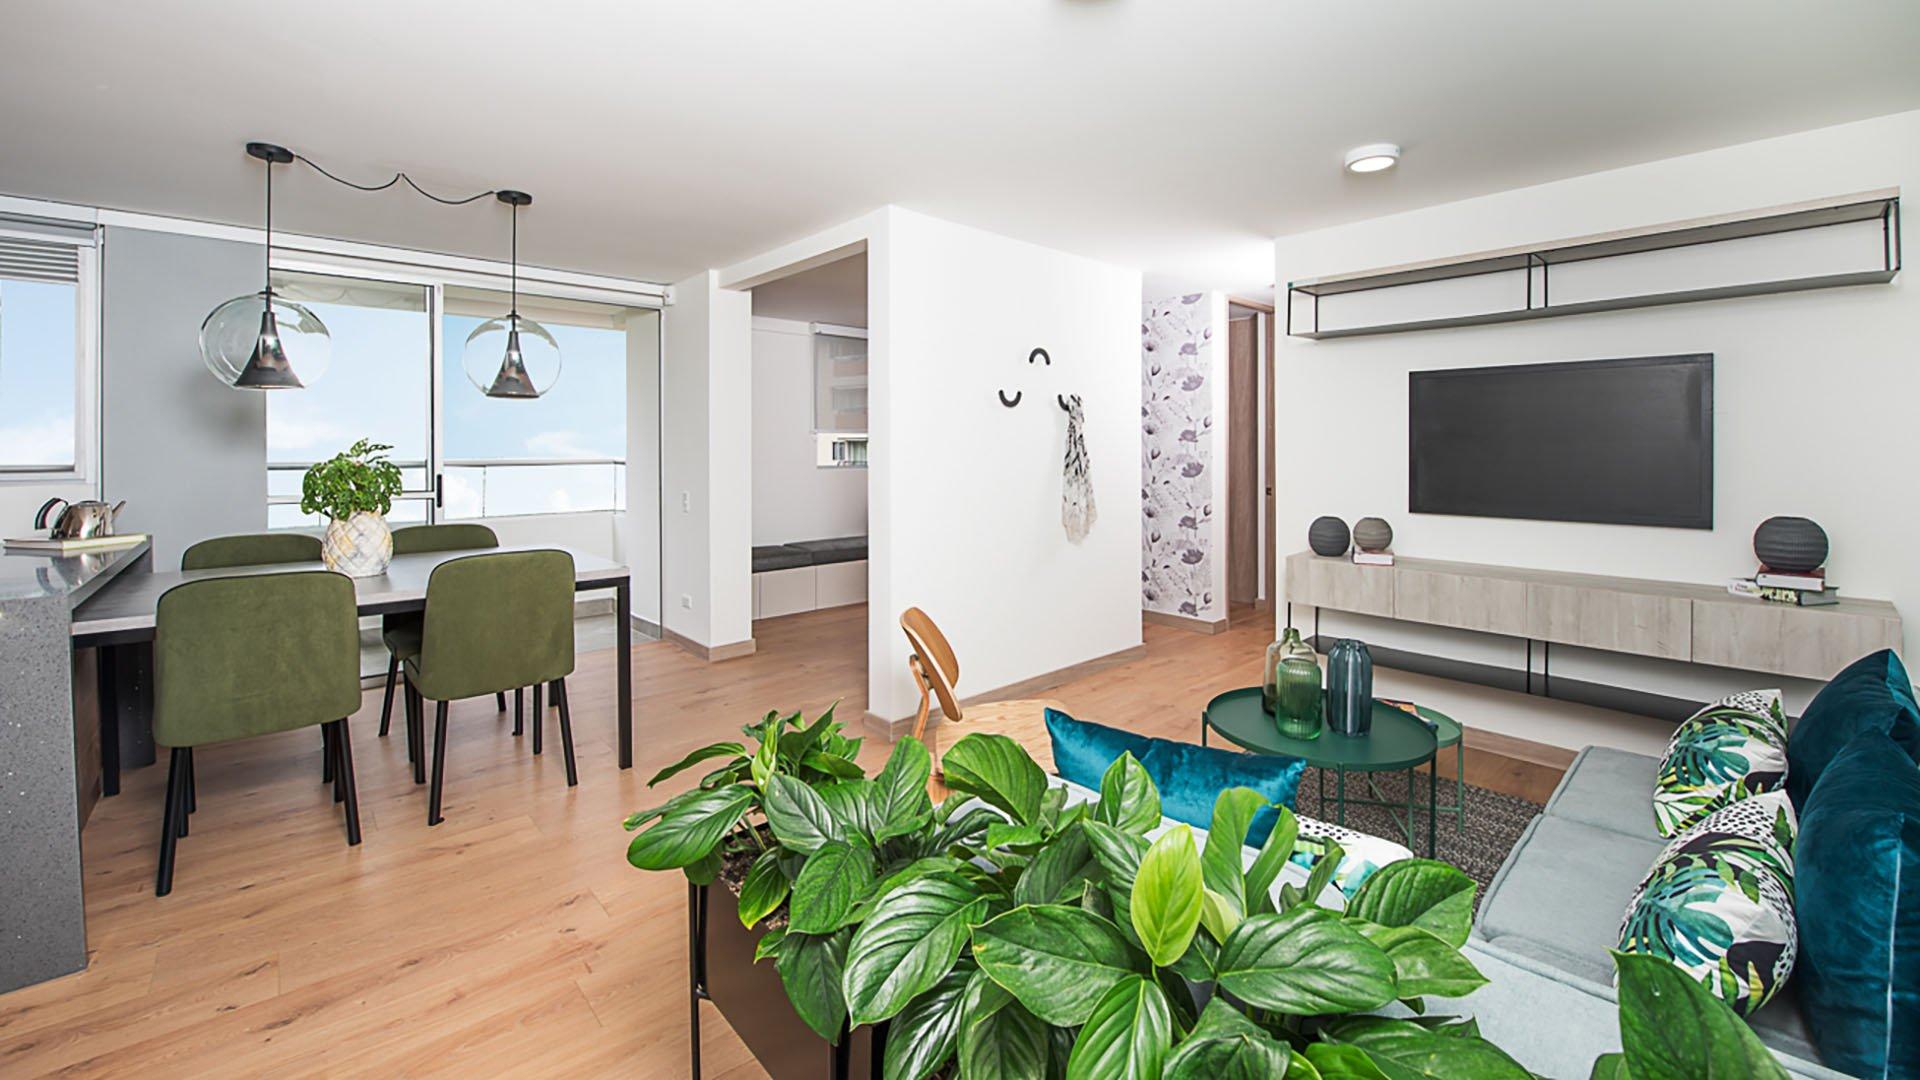 Foresta-conaltura-apartamento-amplio-iluminado-medellin